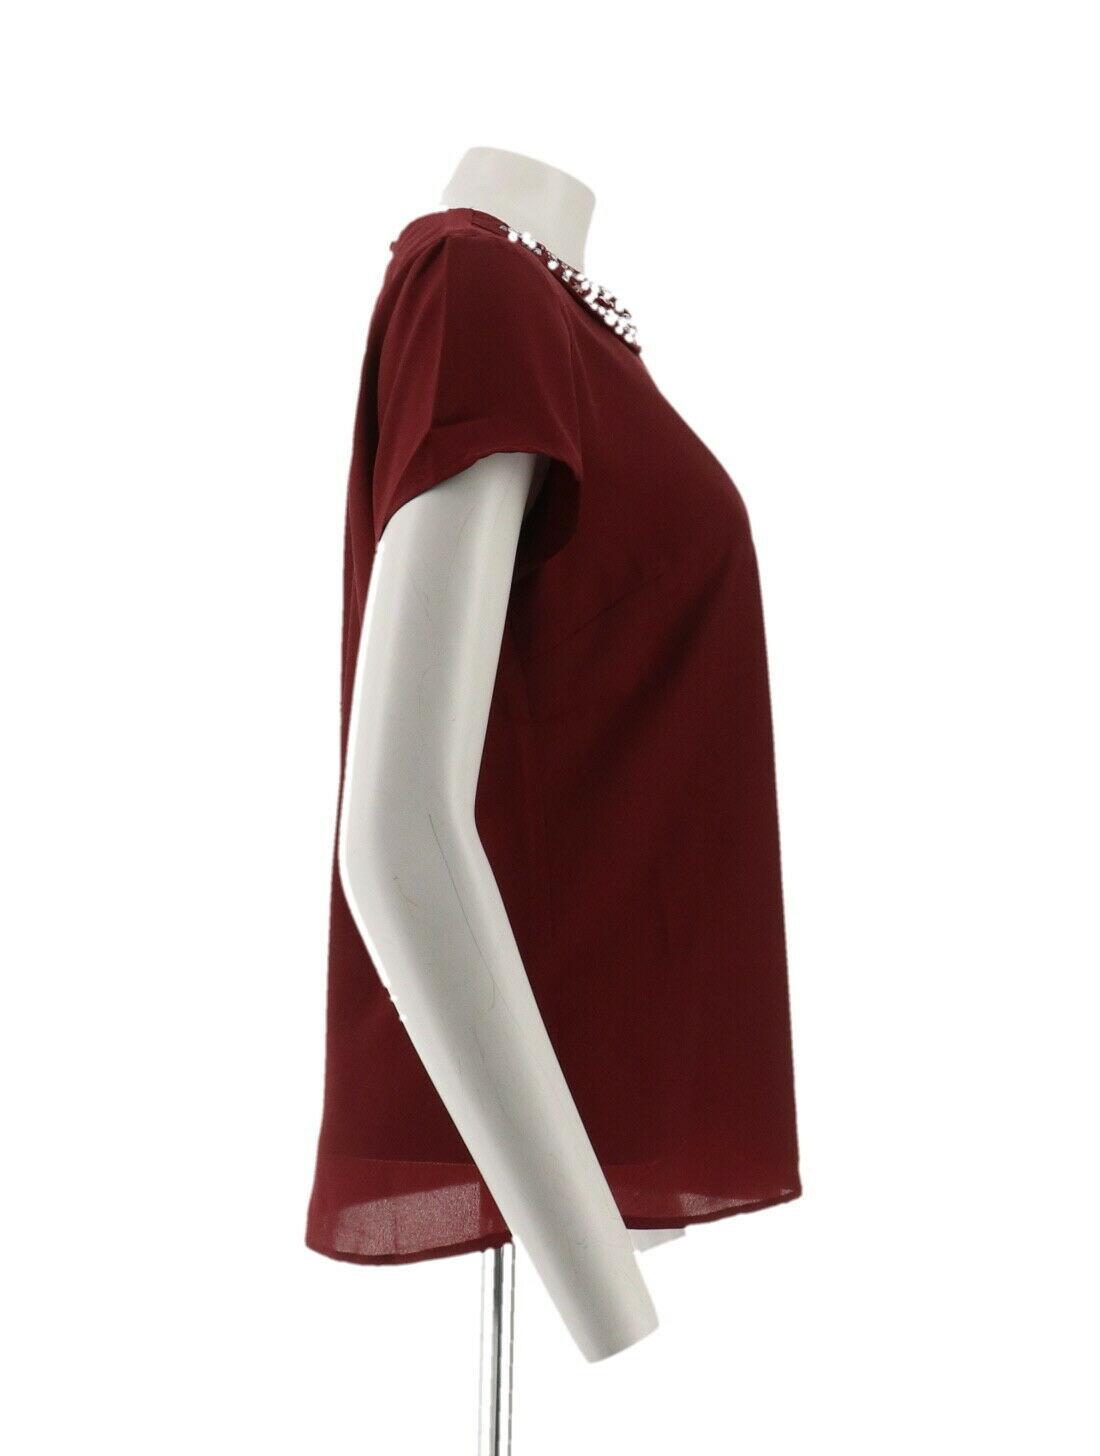 Dennis Basso Short Slv Top Embellished Peter Pan Collar Solid Wine 6 NEW A261457 image 4